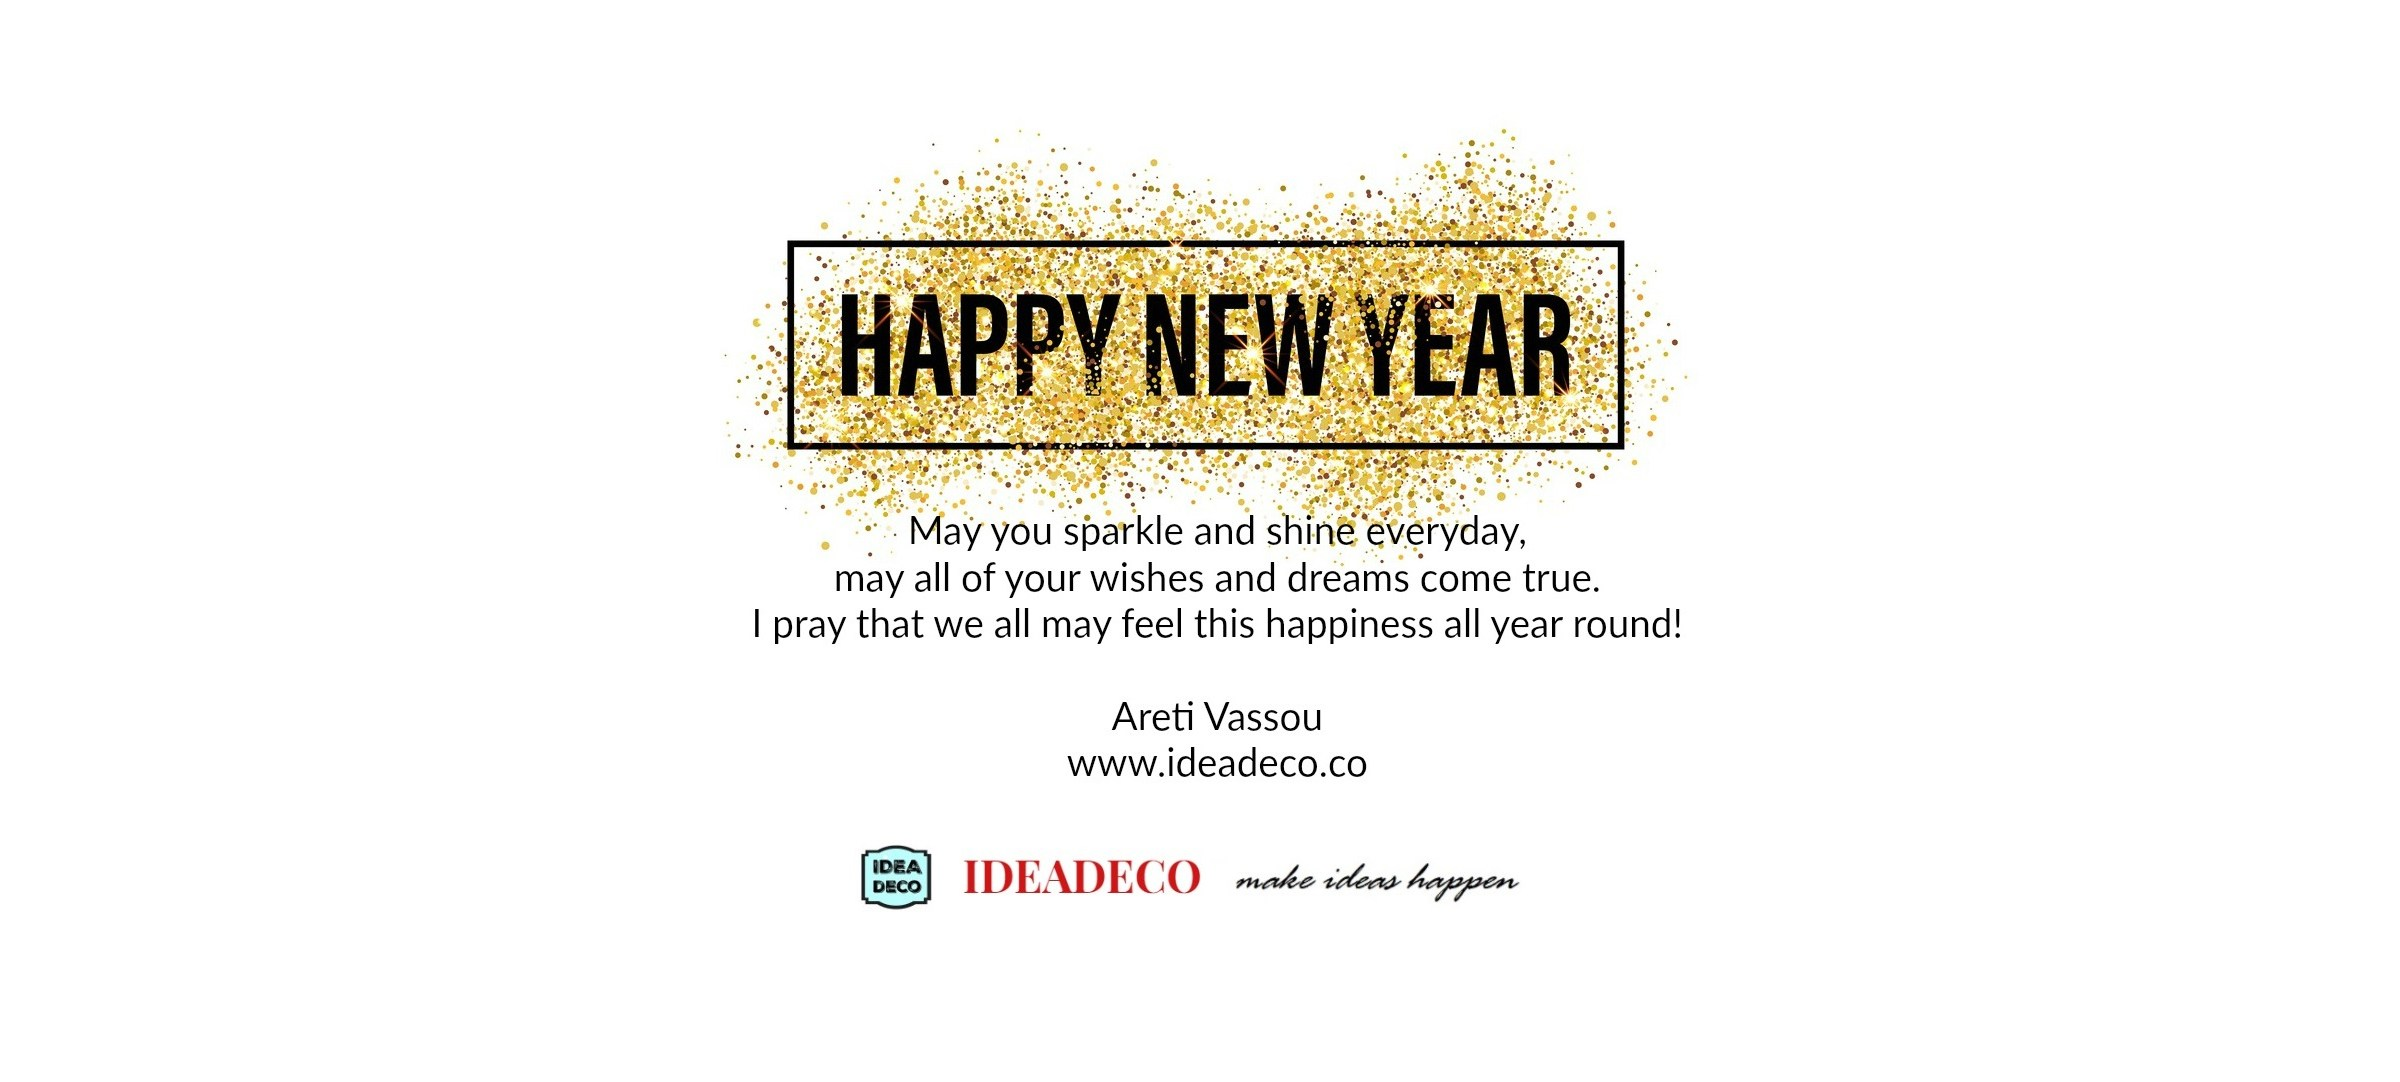 Happy New Year from Areti Vassou and Ideadeco Team